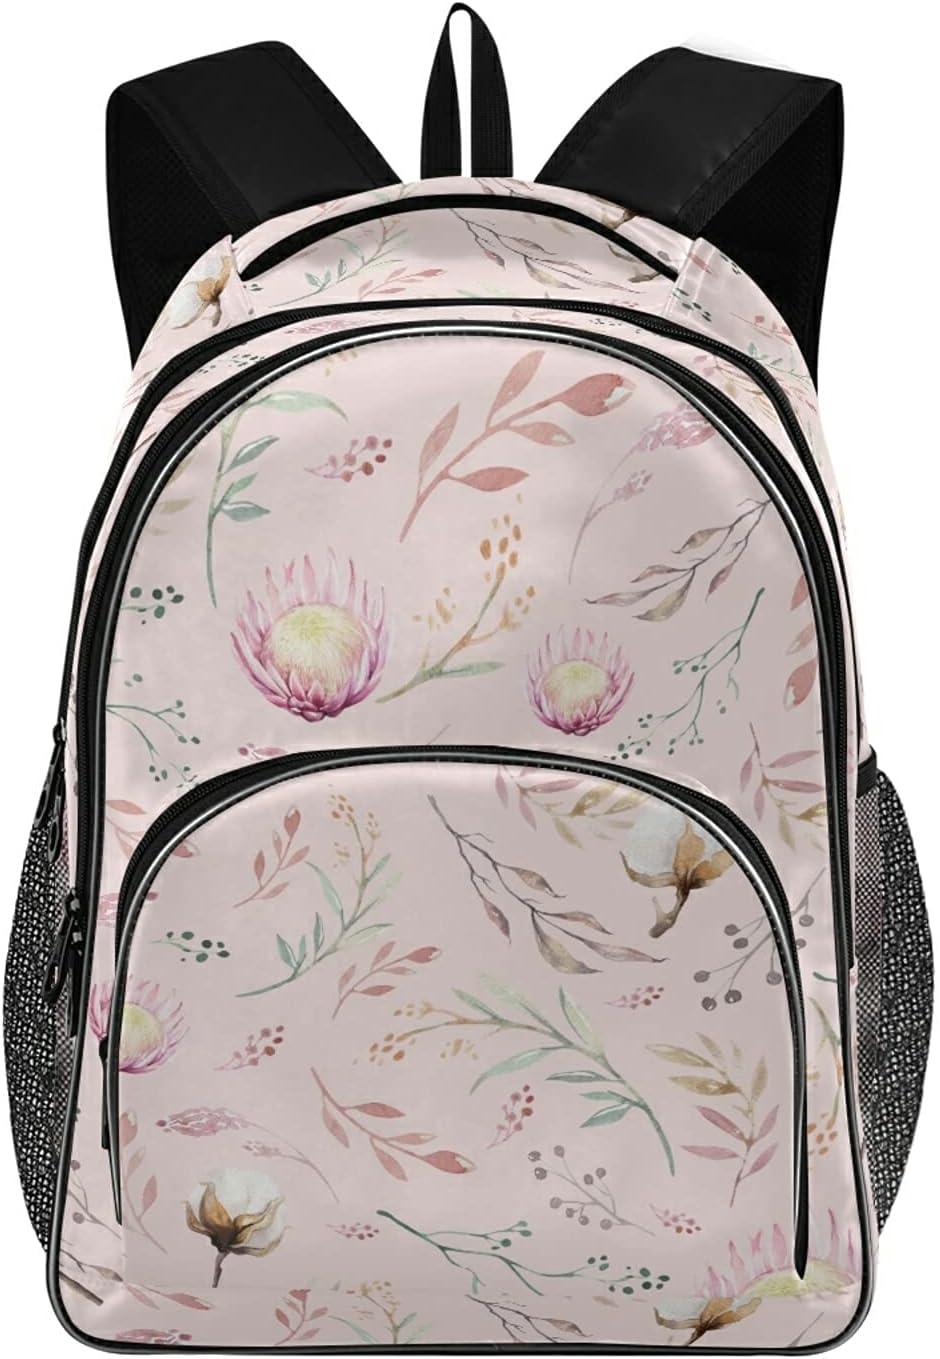 School Backpack Bookbag Laptop Daypack Girls Ranking TOP14 for Very popular Schoolbag Women